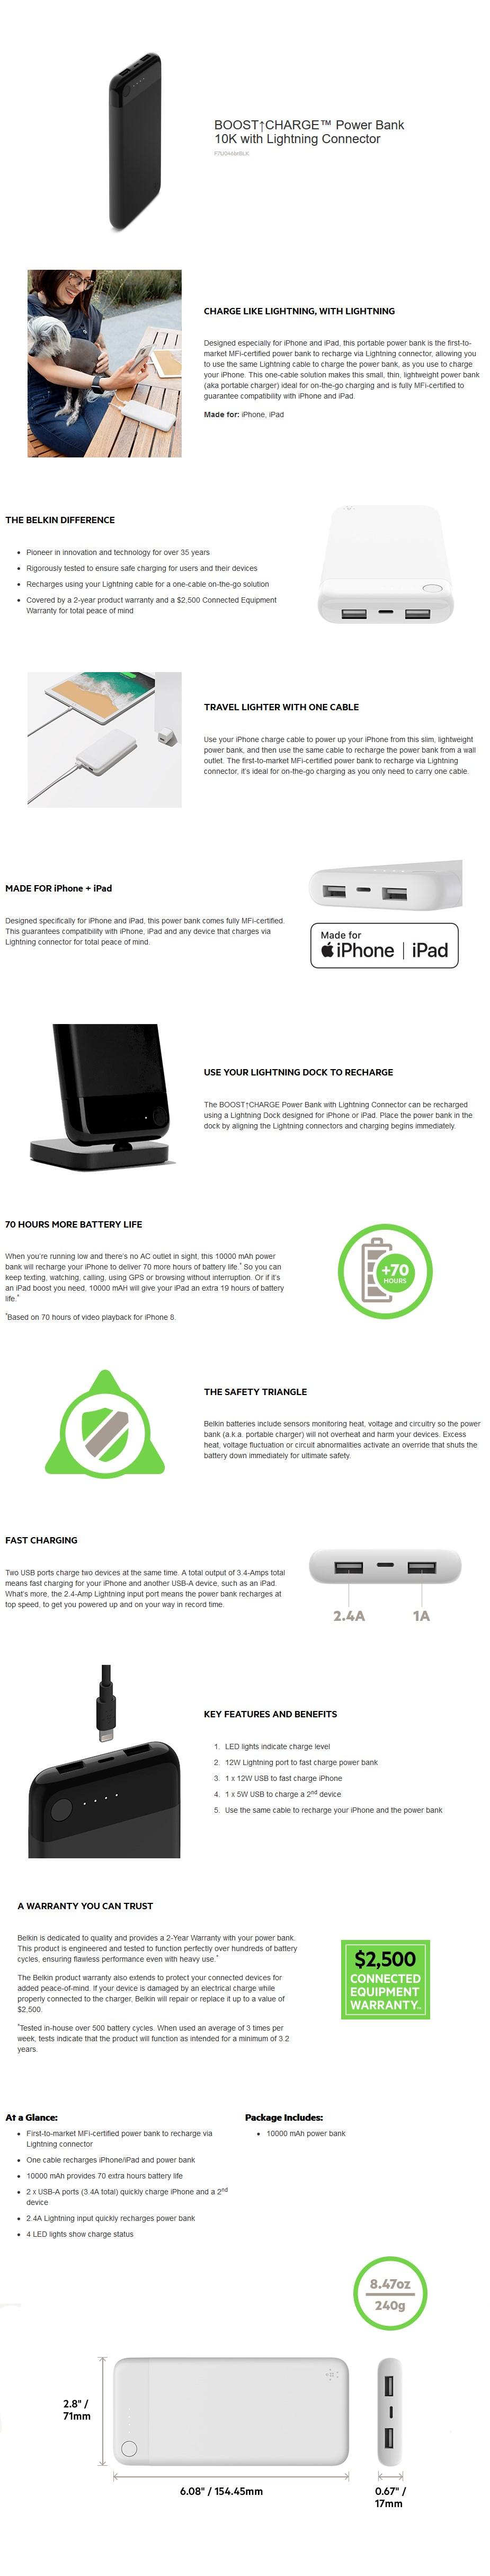 Belkin Boost Charge 10K Power Bank with Lightning Connector - Black - Desktop Overview 1